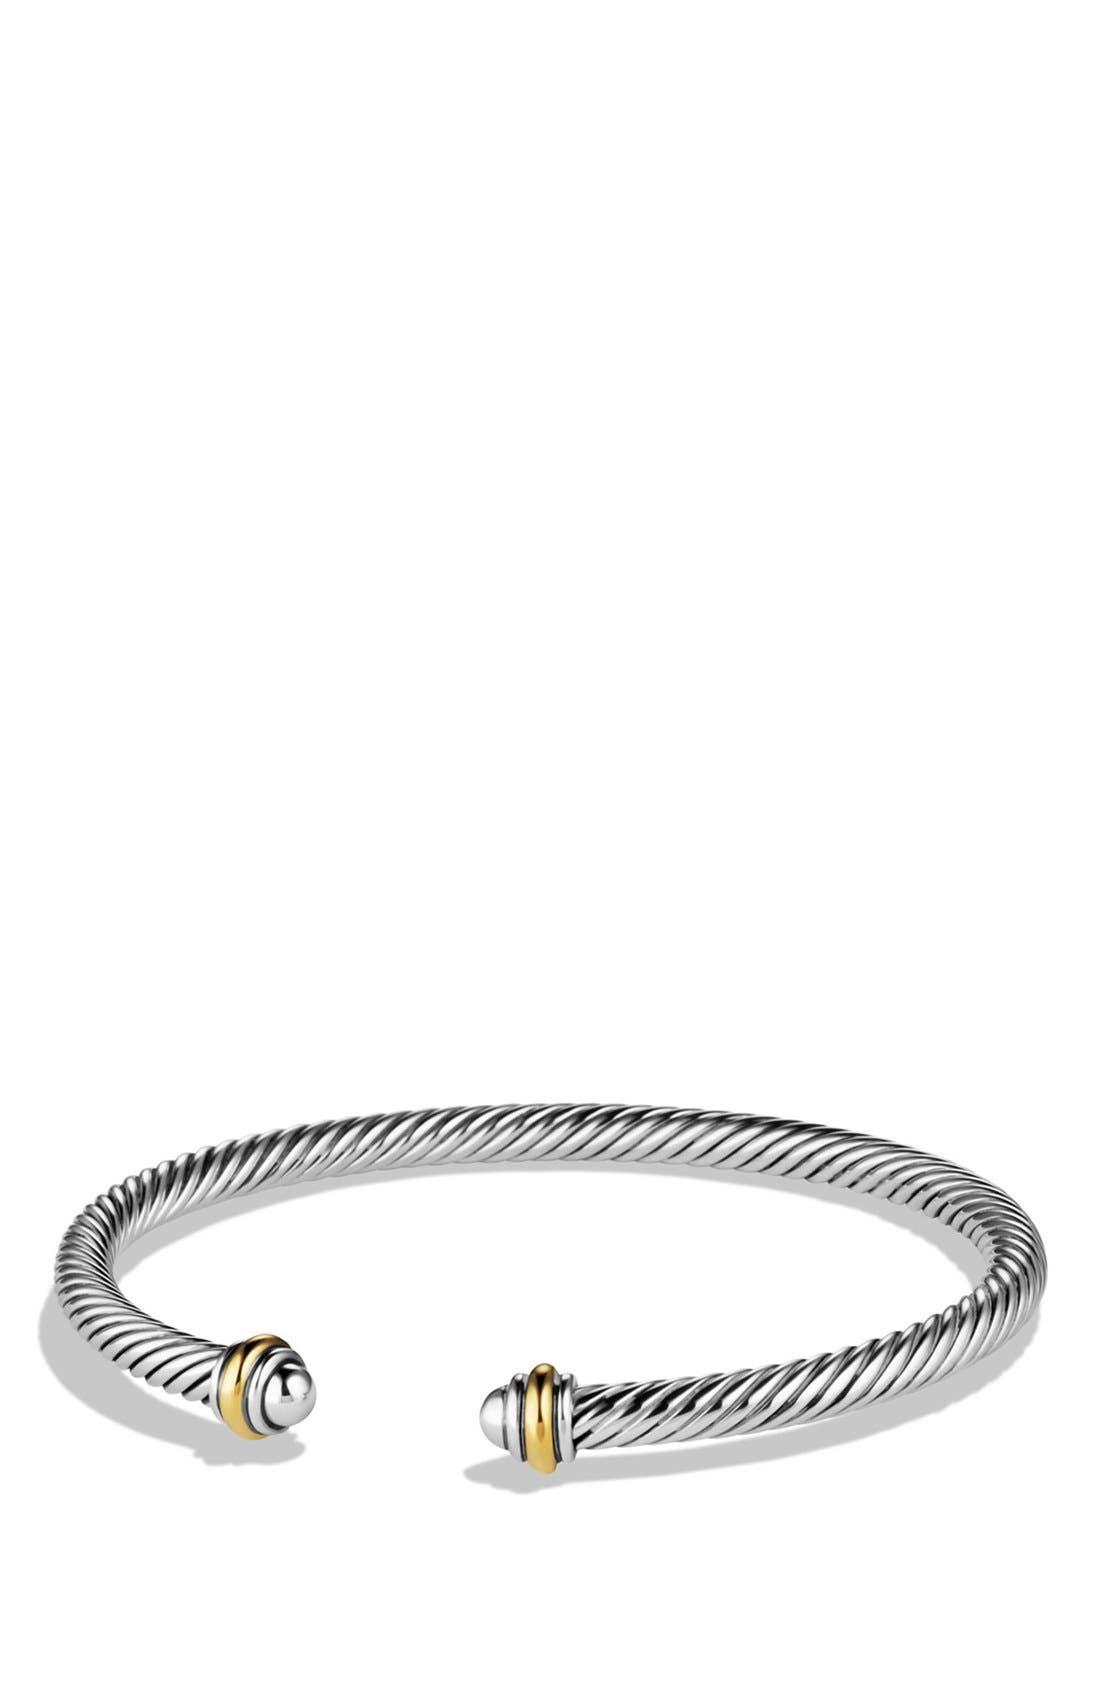 david yurman u0027cable bracelet with gold